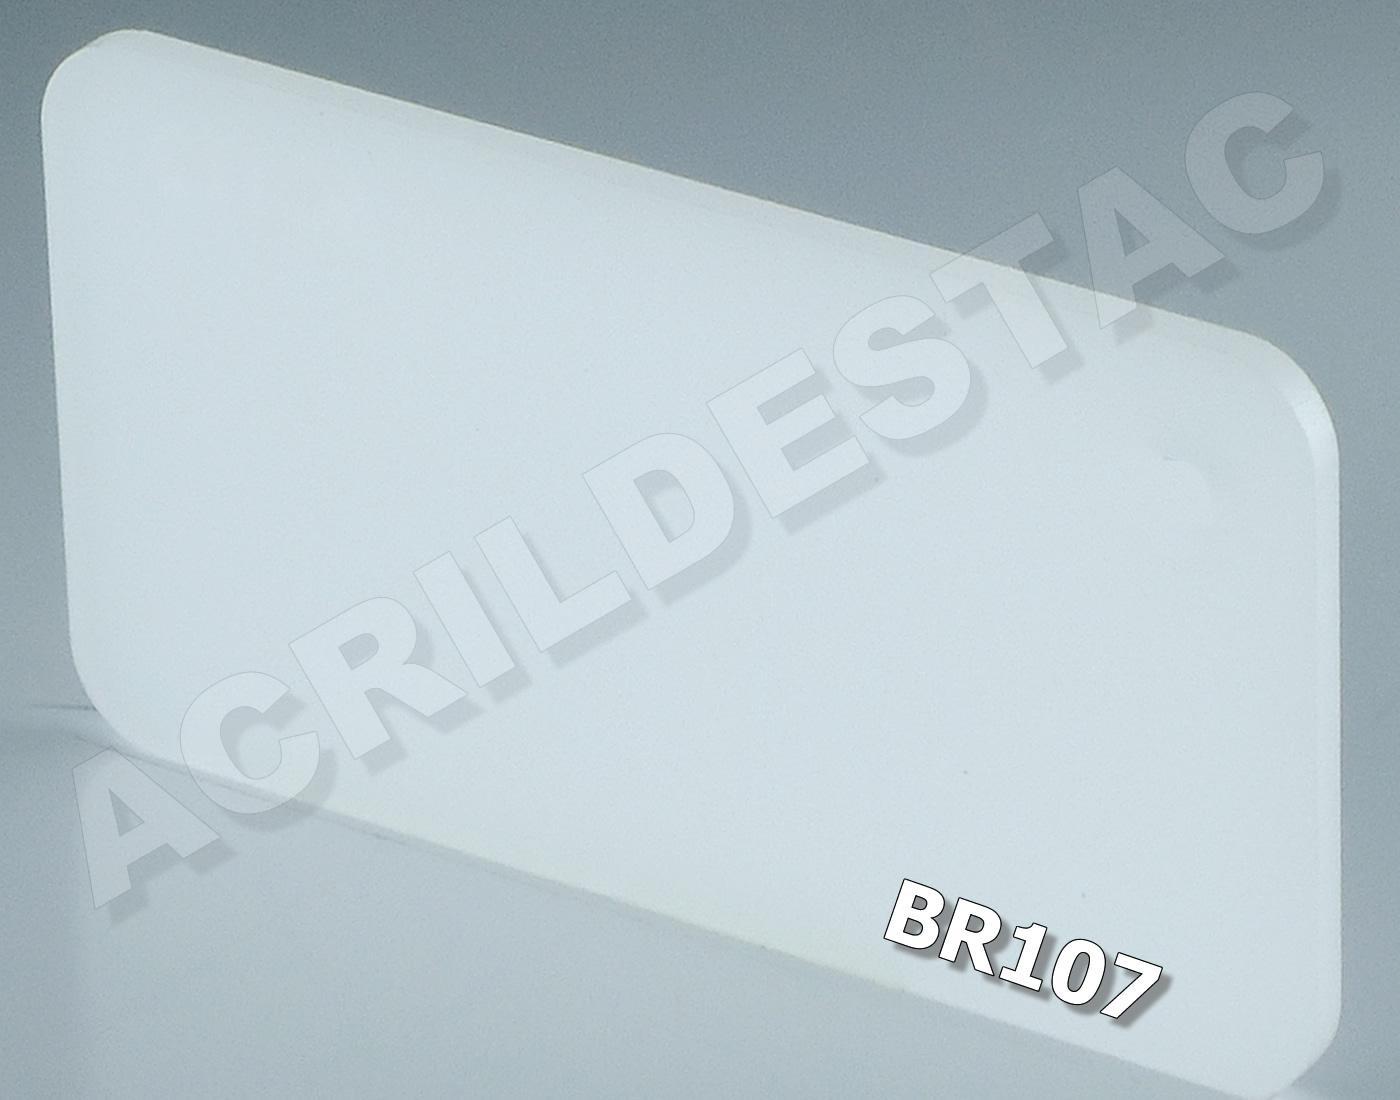 0.50 x 0.50 - 3mm - BRANCO Translúcido PL-BR107 -